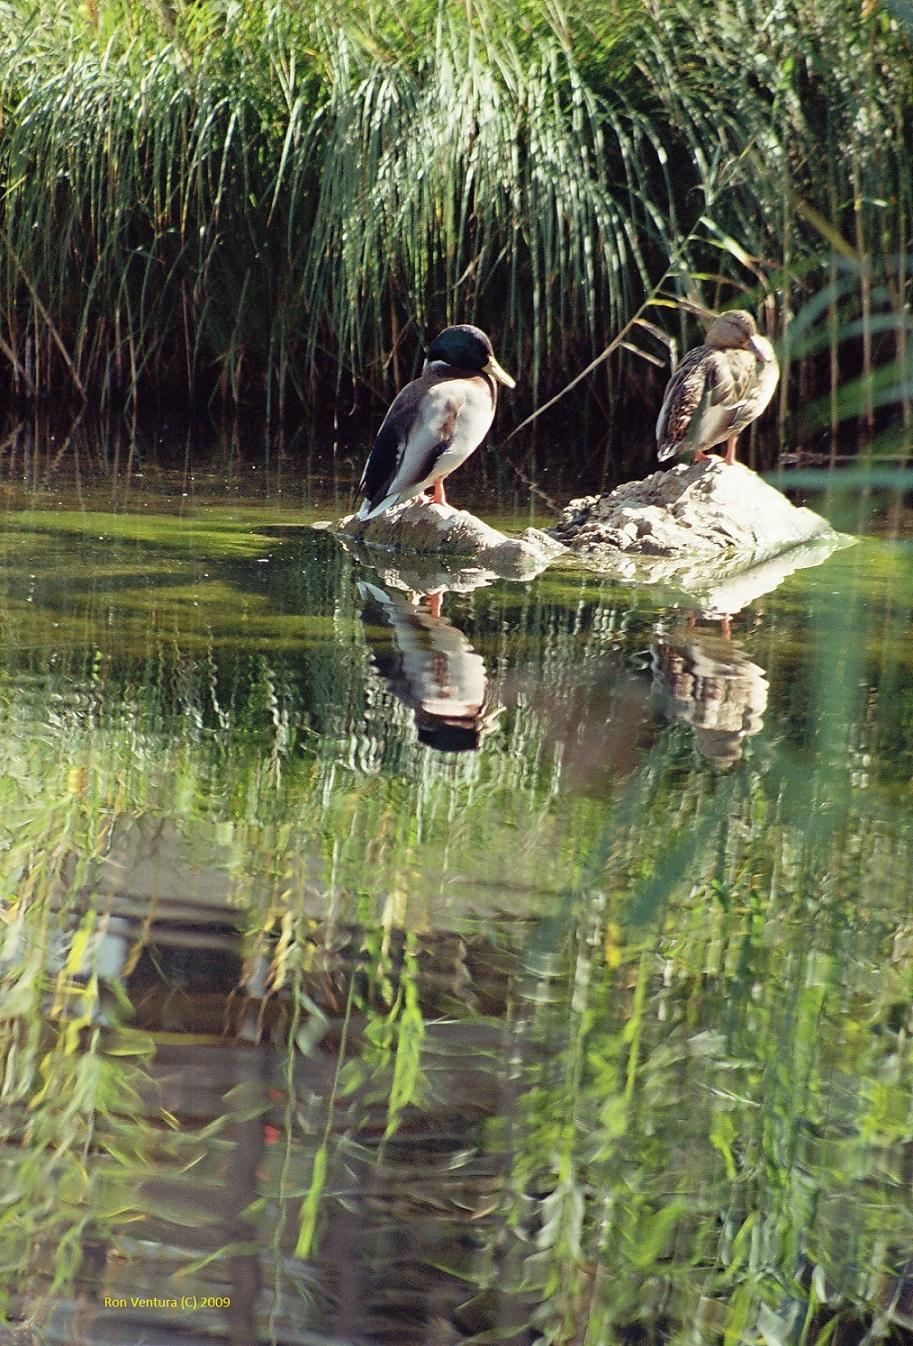 A Couple of Ducks Pausing on Rocks